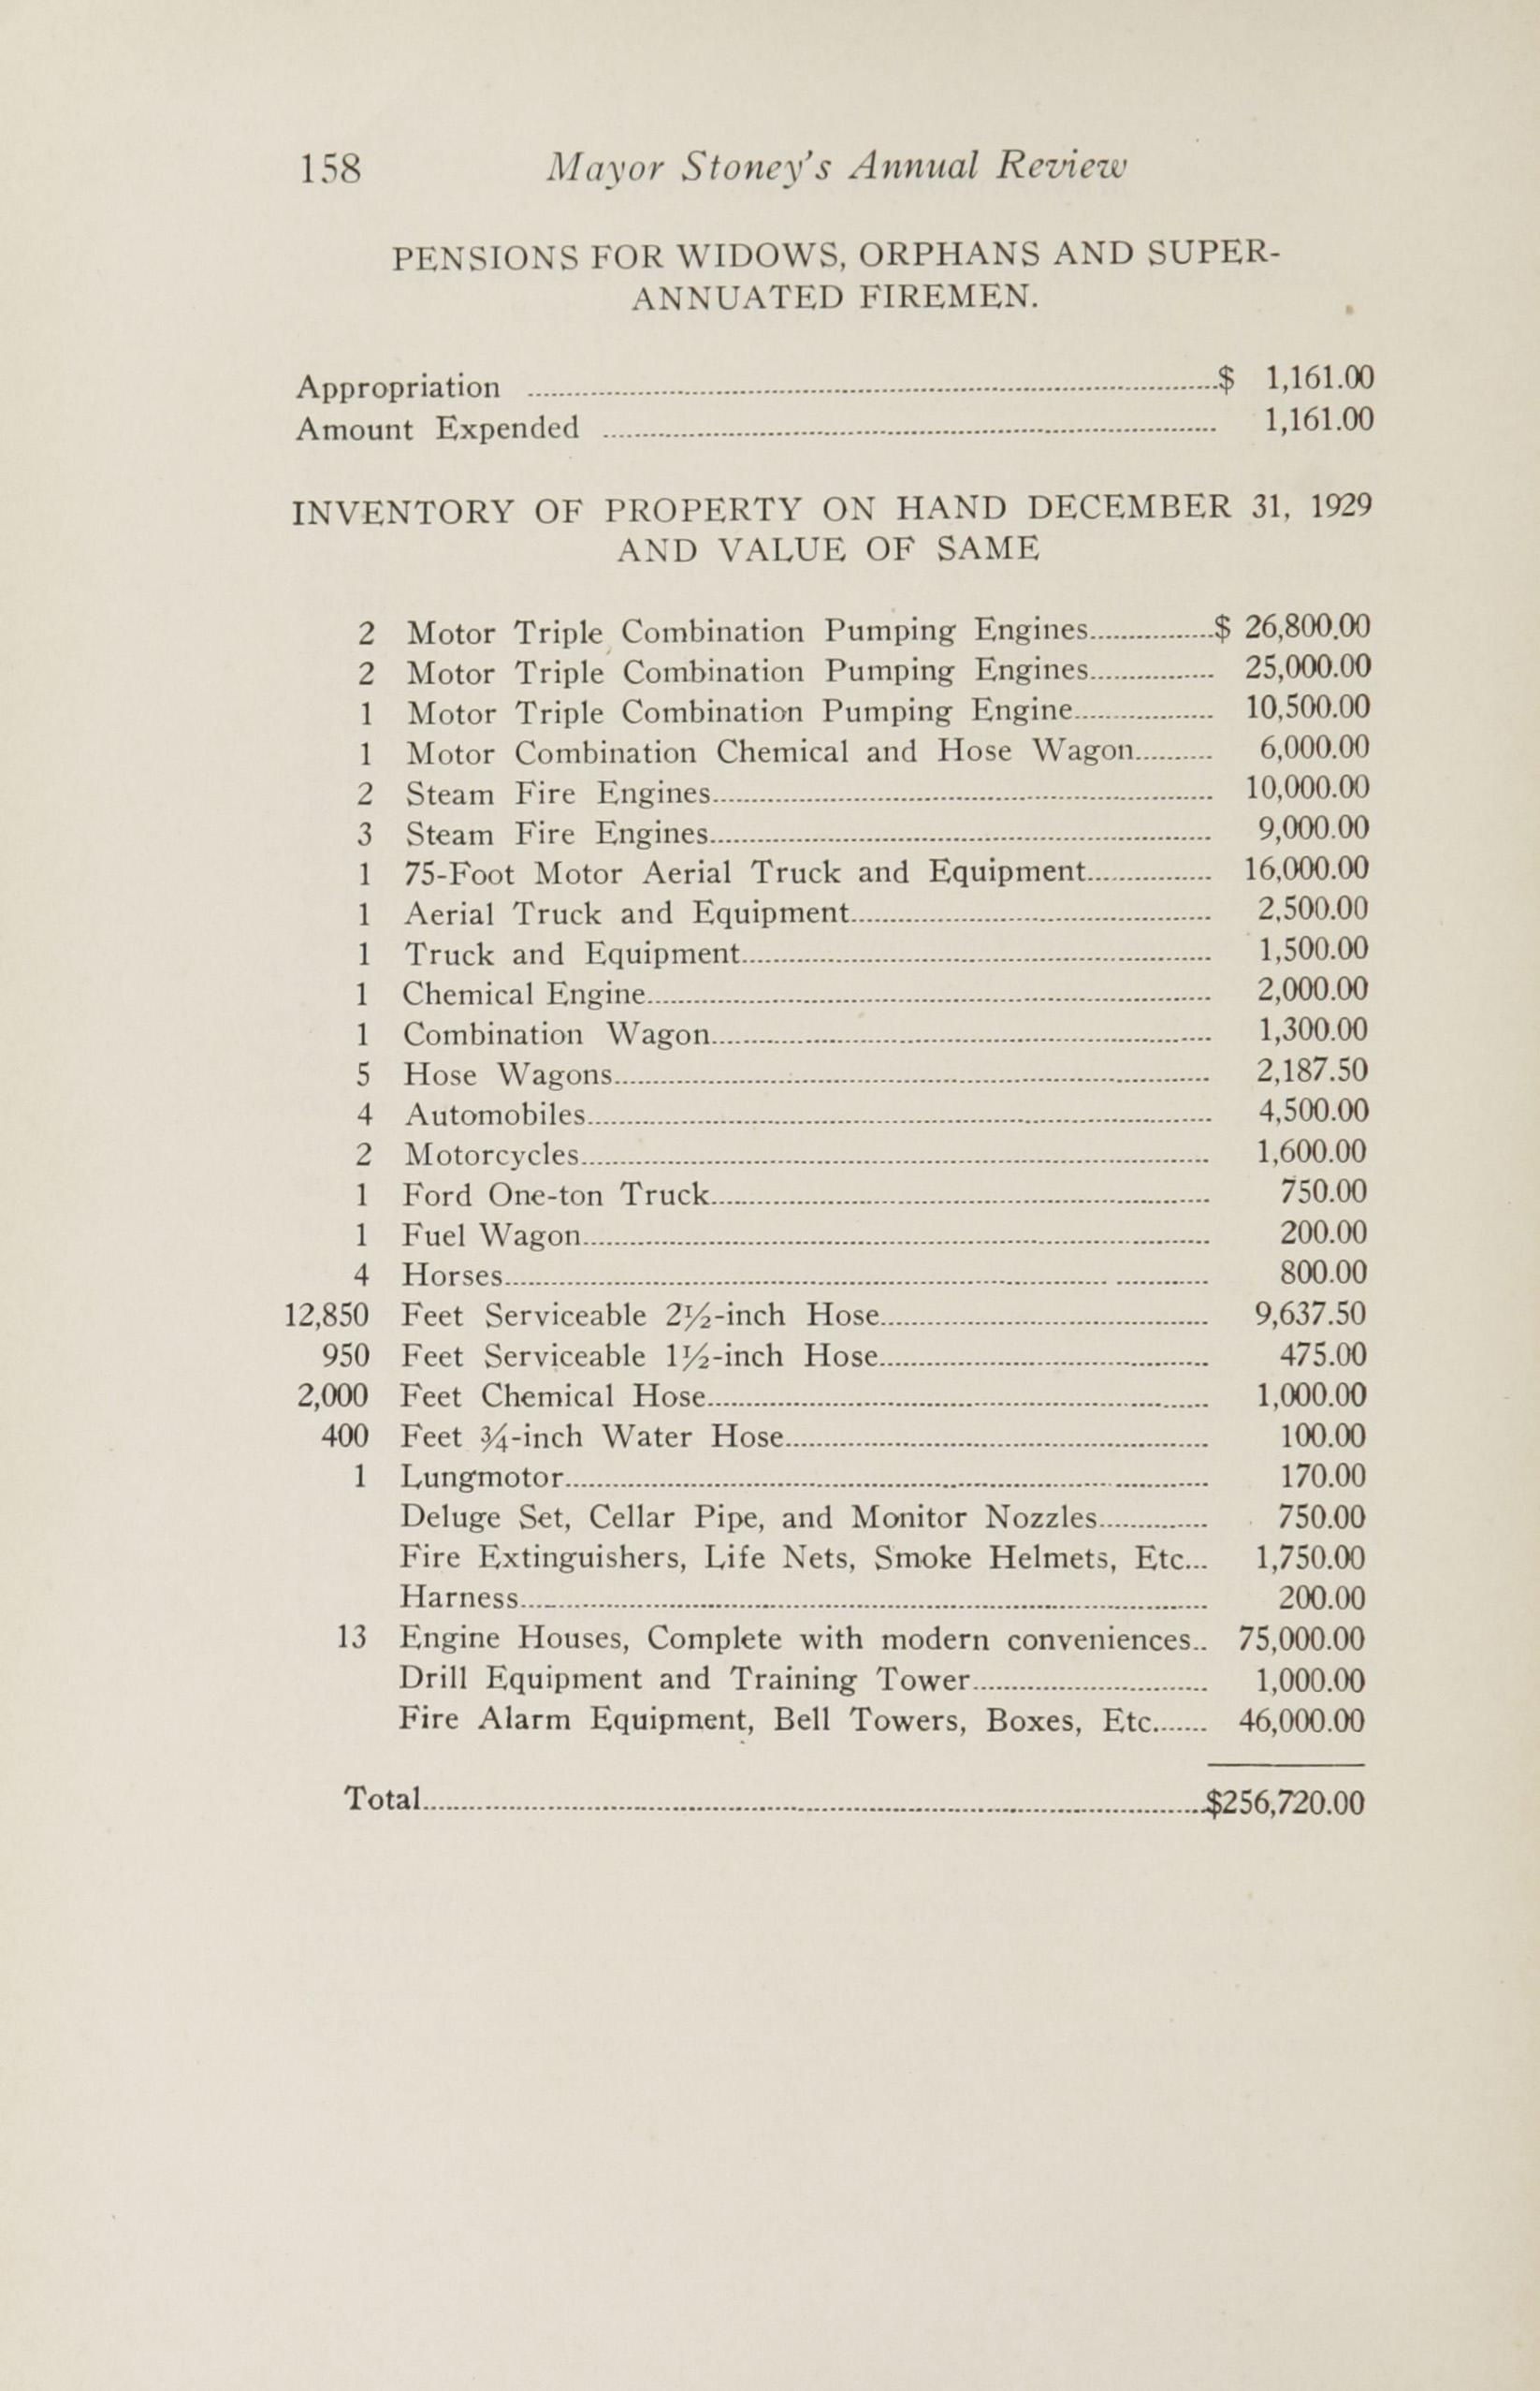 Charleston Yearbook, 1929, page 158